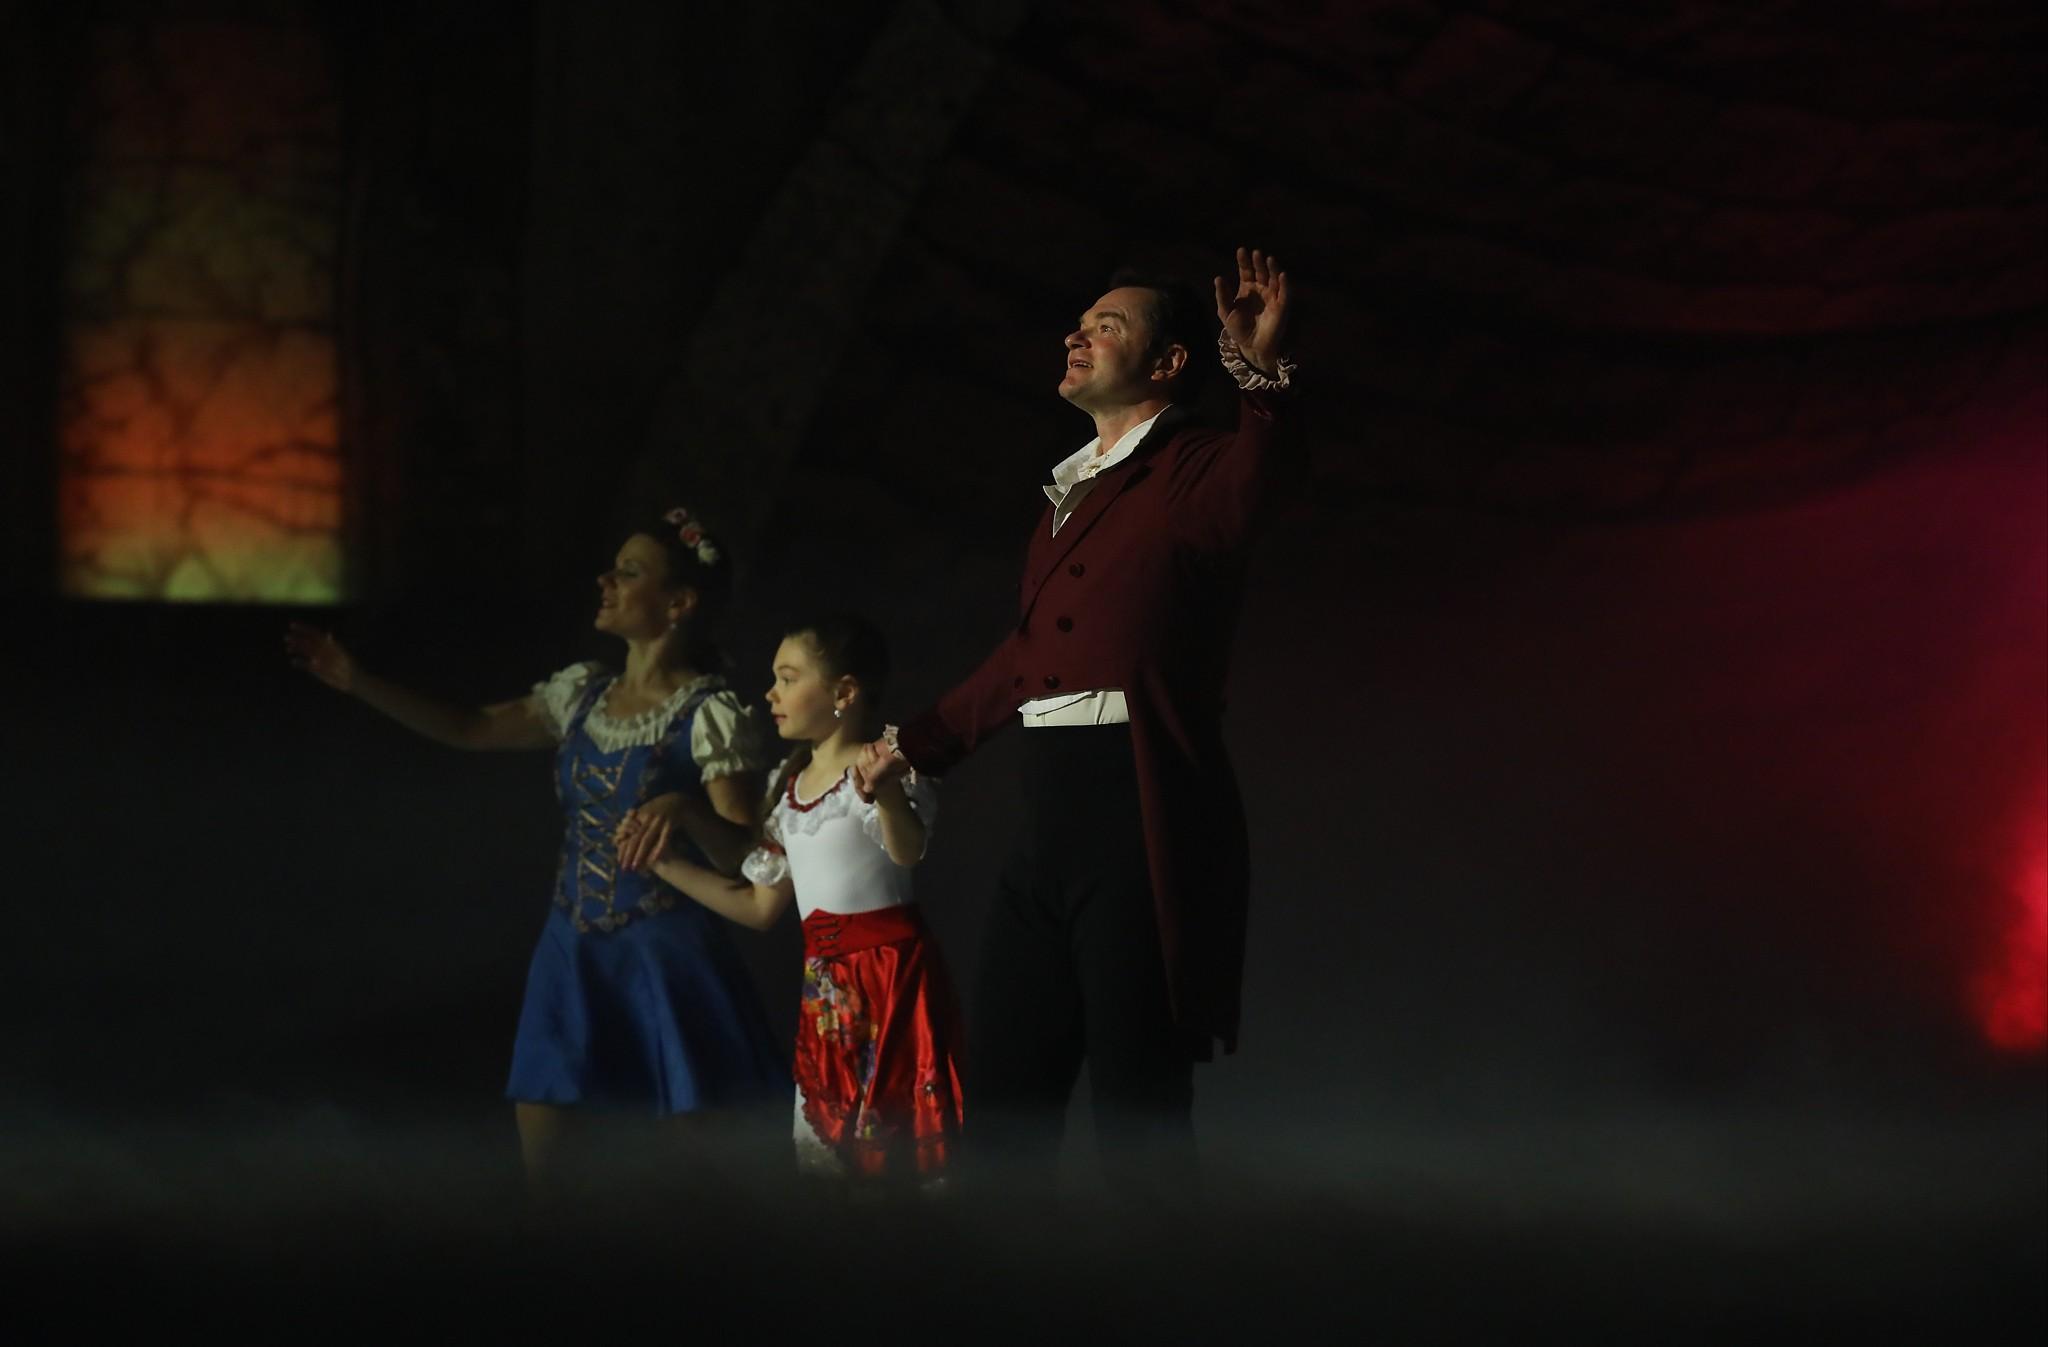 Мария Петрова-Алексей Тихонов - Страница 7 Qs3oiSpCOhE